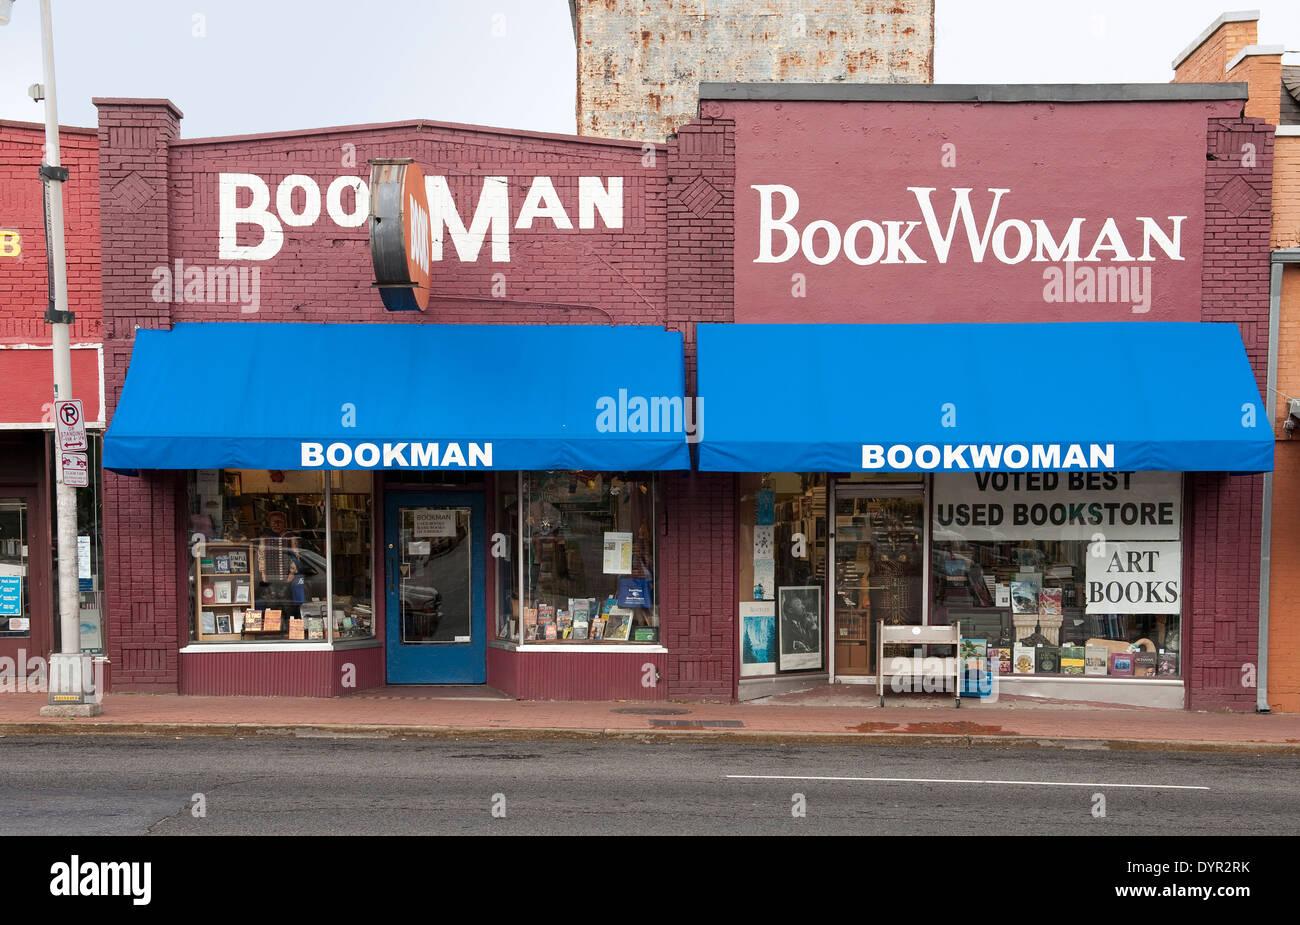 Bookman_Bookwoman Bookstore in Hillsboro Village, Nashville Tennessee - Stock Image